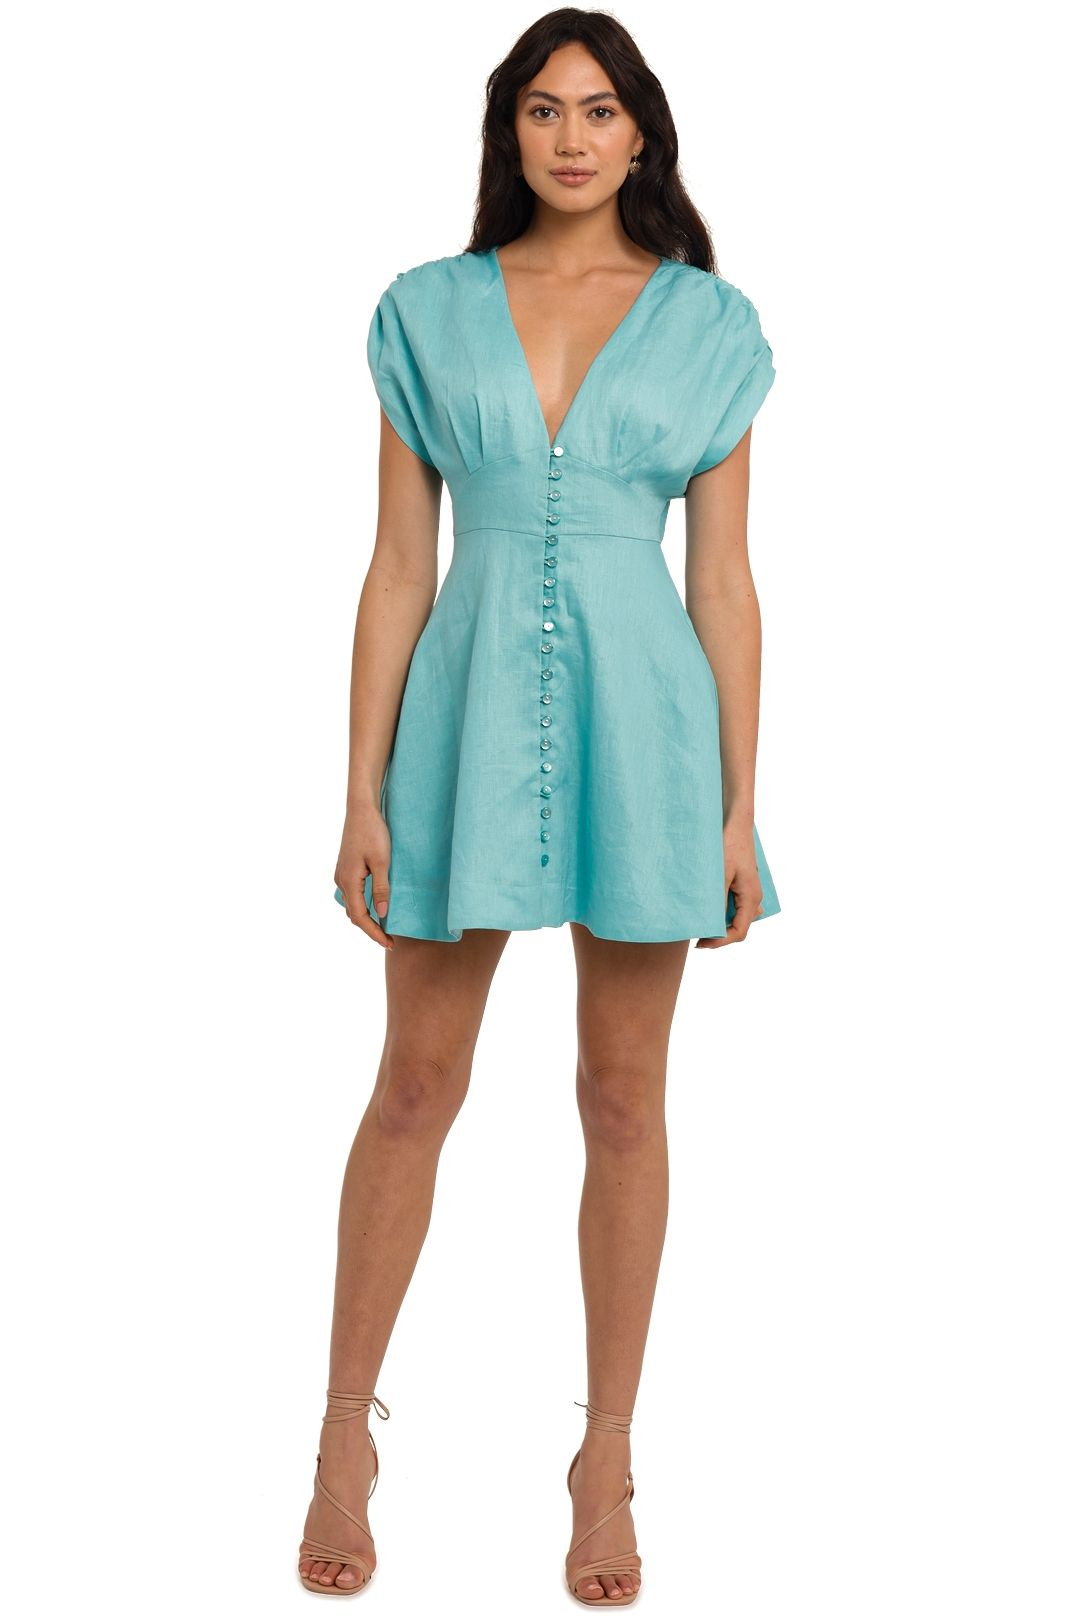 Nicholas Claudia Dress Pool blue